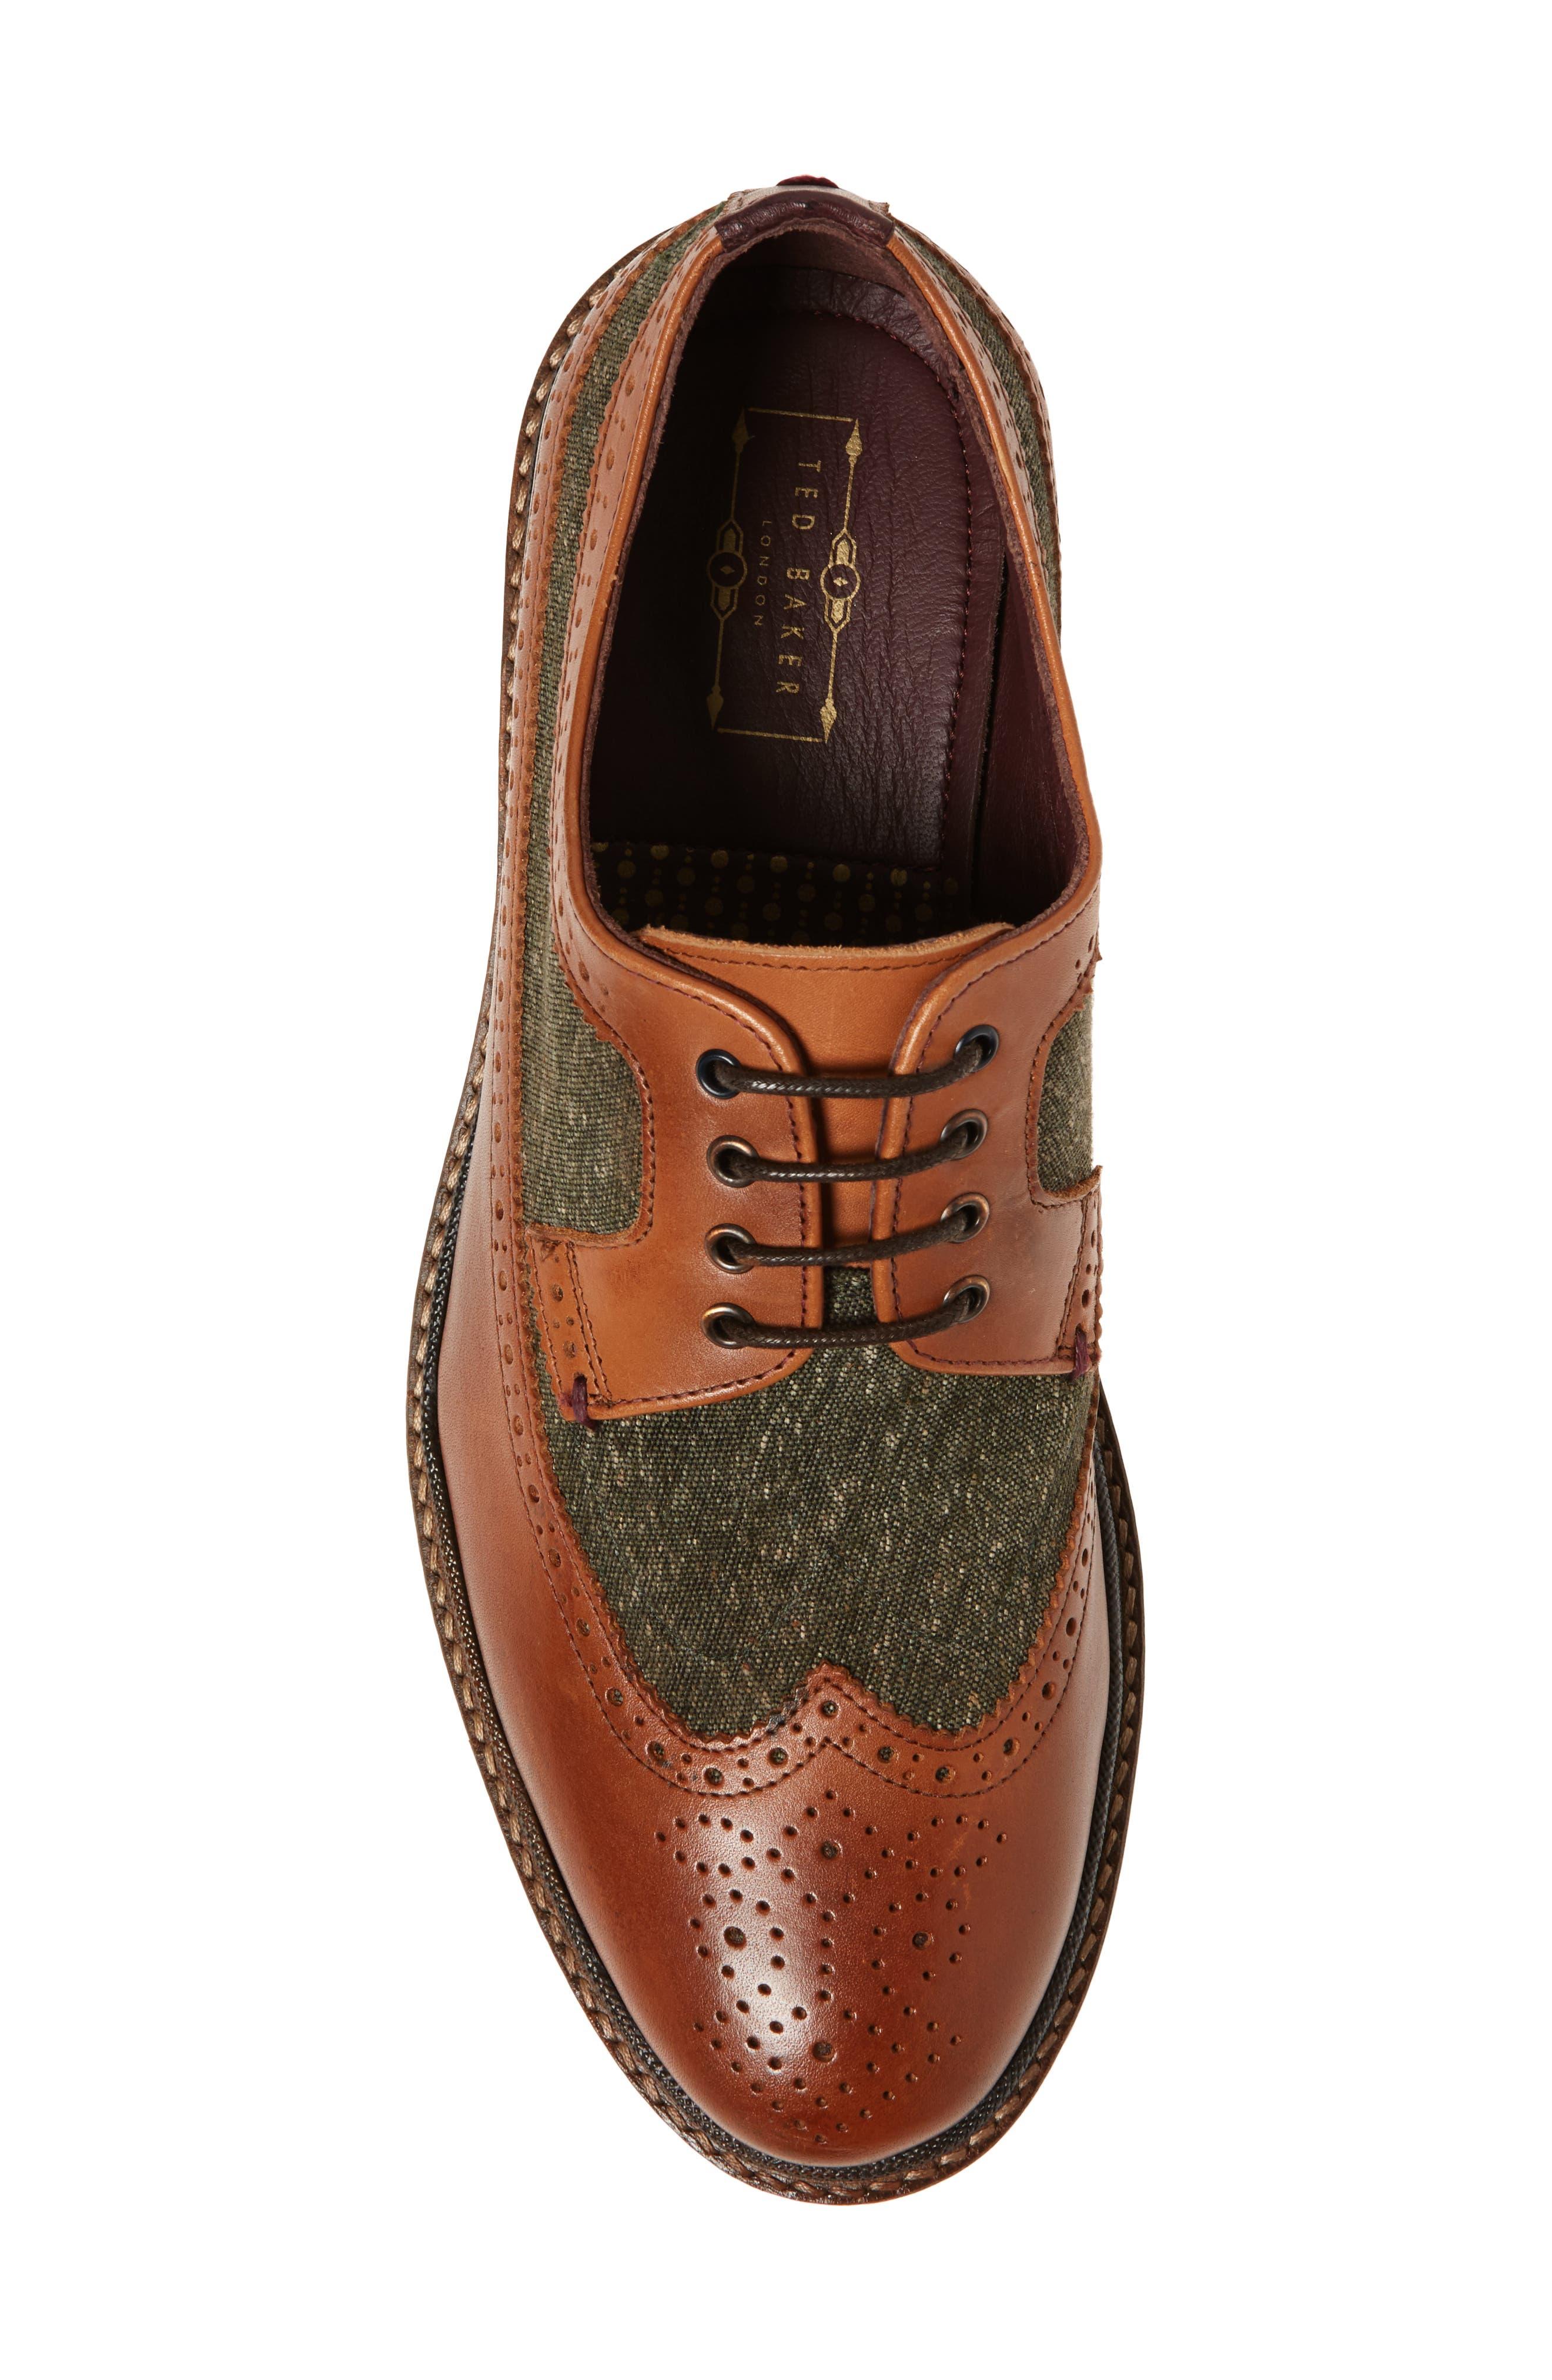 Casbo Spectator Shoe,                             Alternate thumbnail 5, color,                             Tan Multi Leather